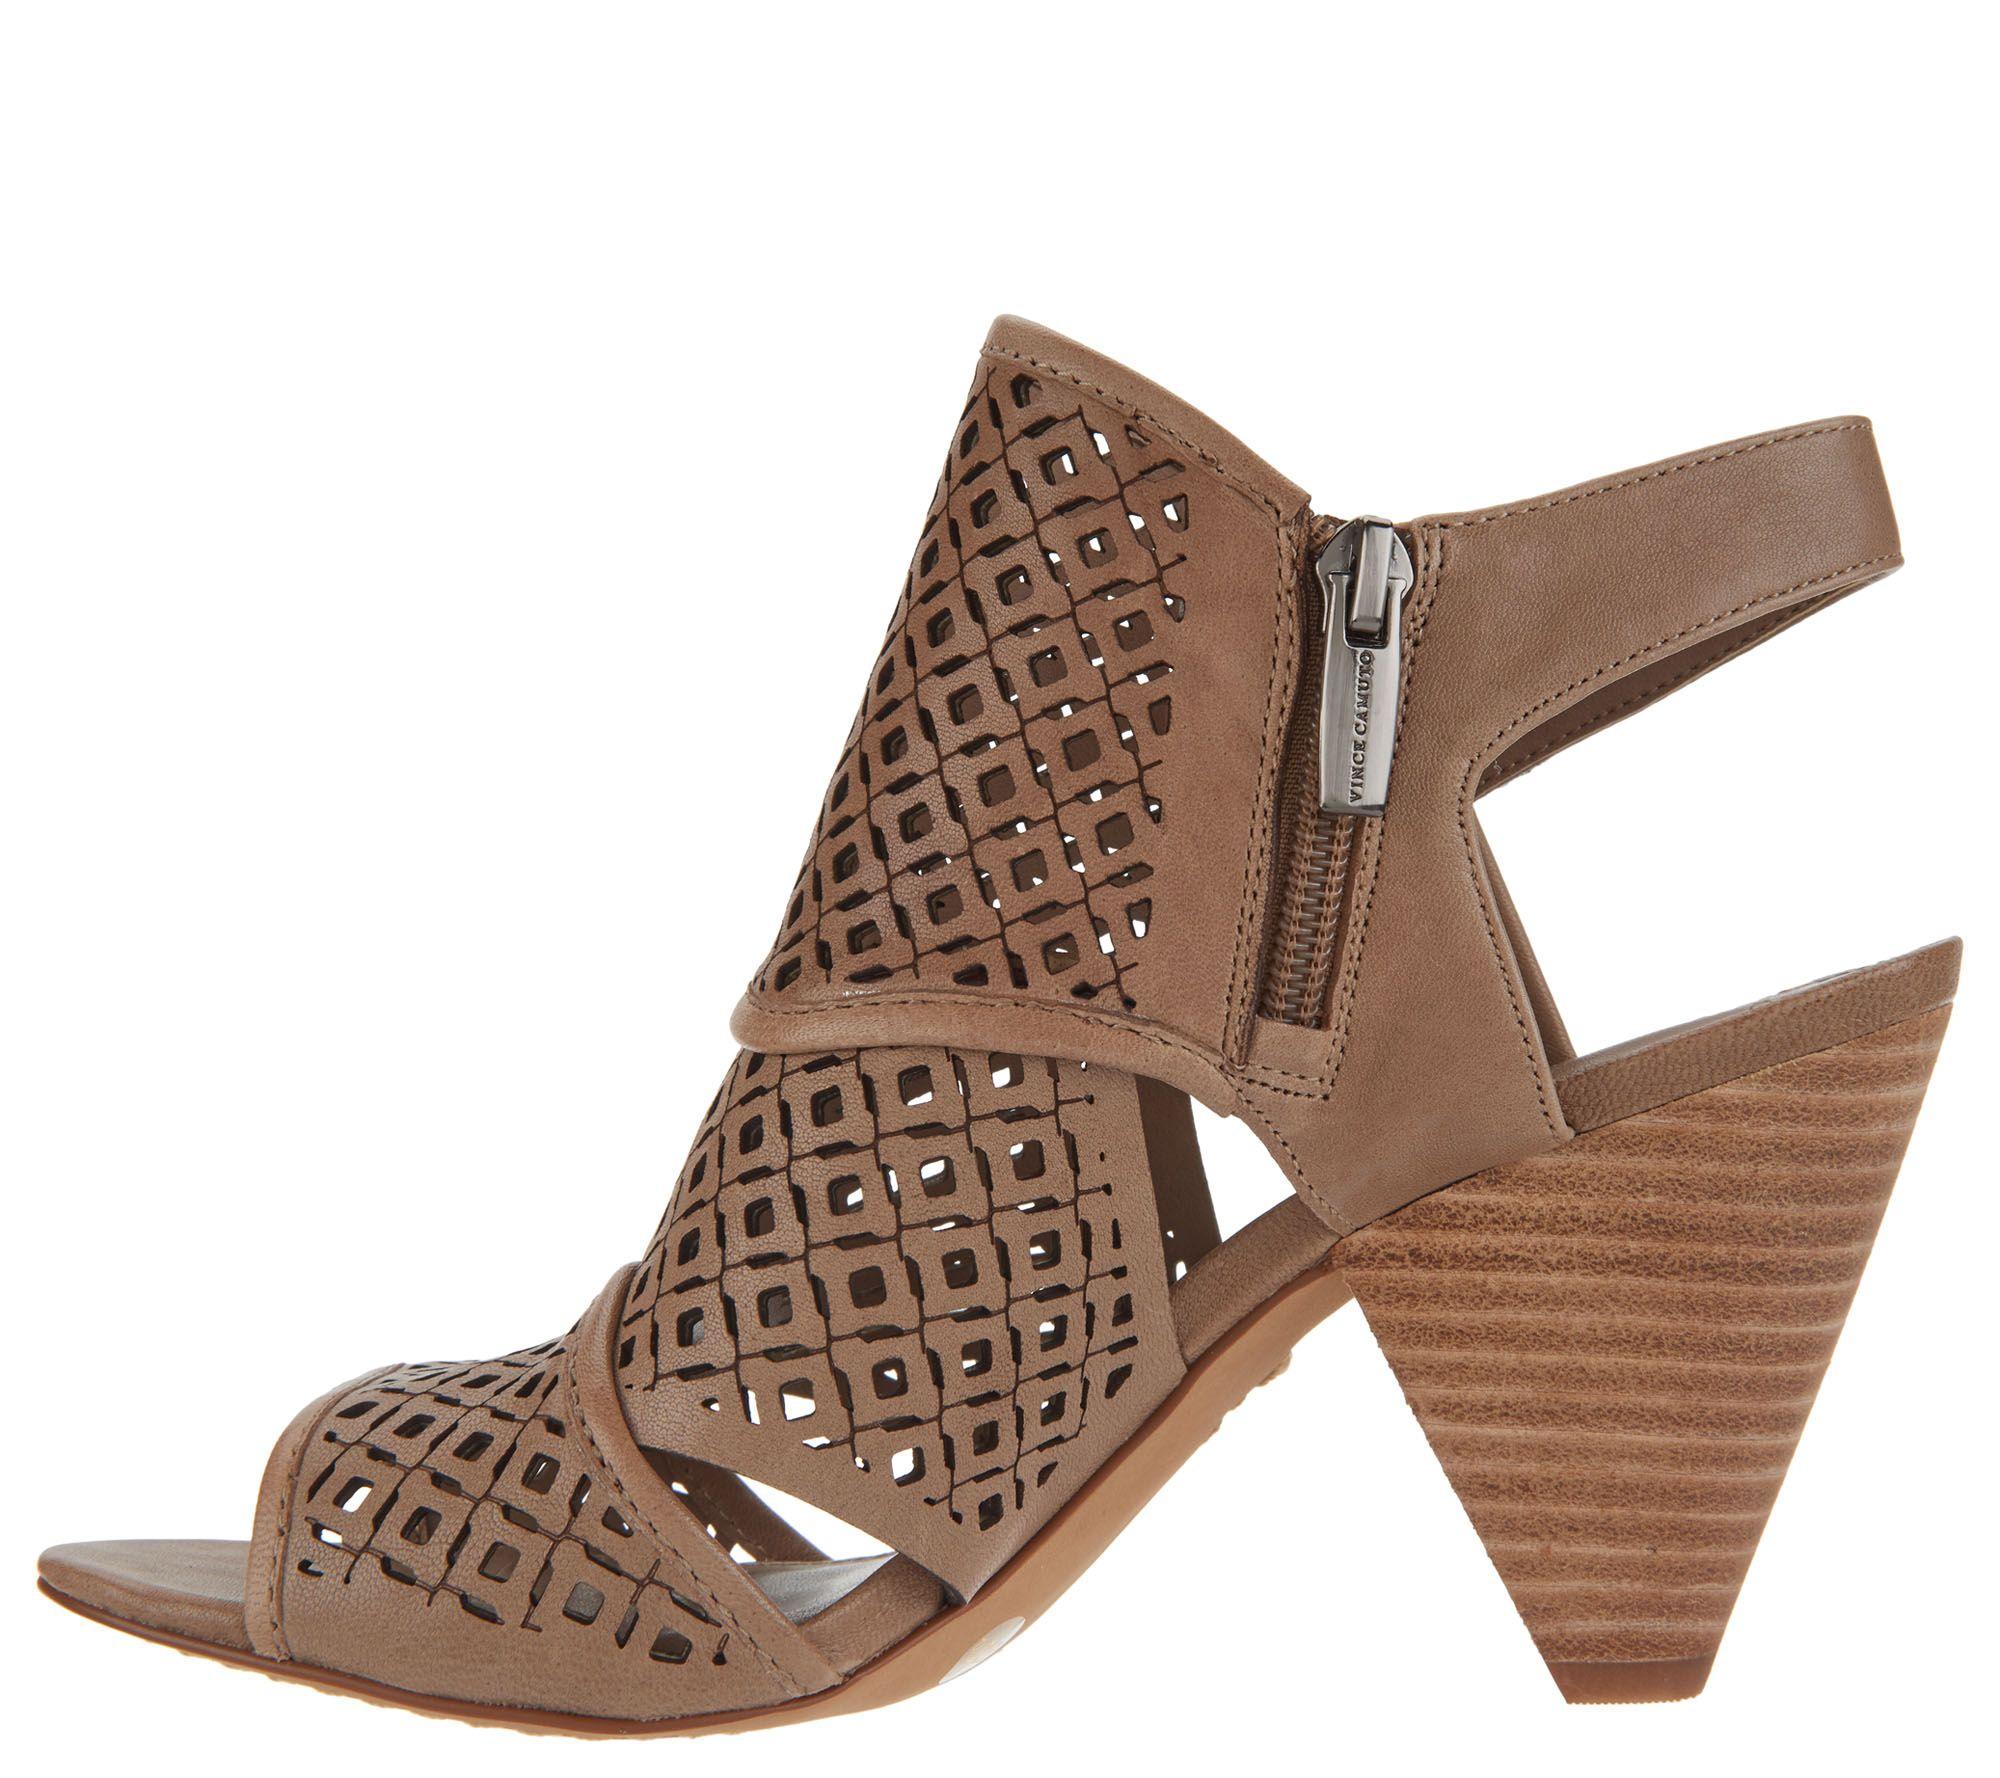 e5988fde237c Vince Camuto Nubuck Perforated Heeled Sandals - Ekanya - Page 1 — QVC.com